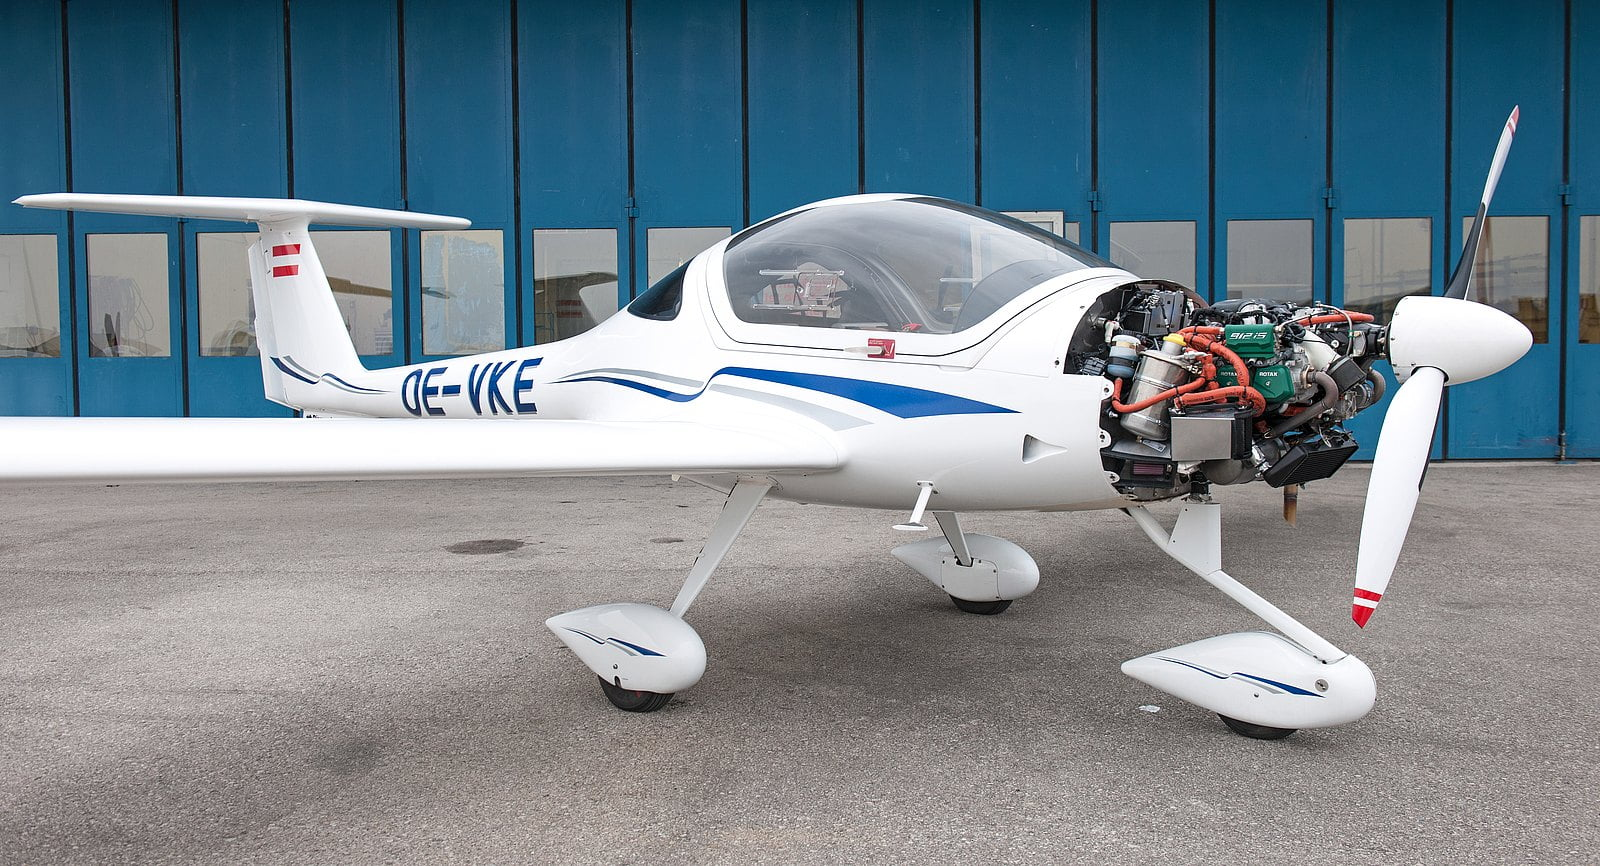 DA20i_Highlight_2_Propulsion_and_Avionics_Bild_0_Teaser_with_Rotax_full_074050c162